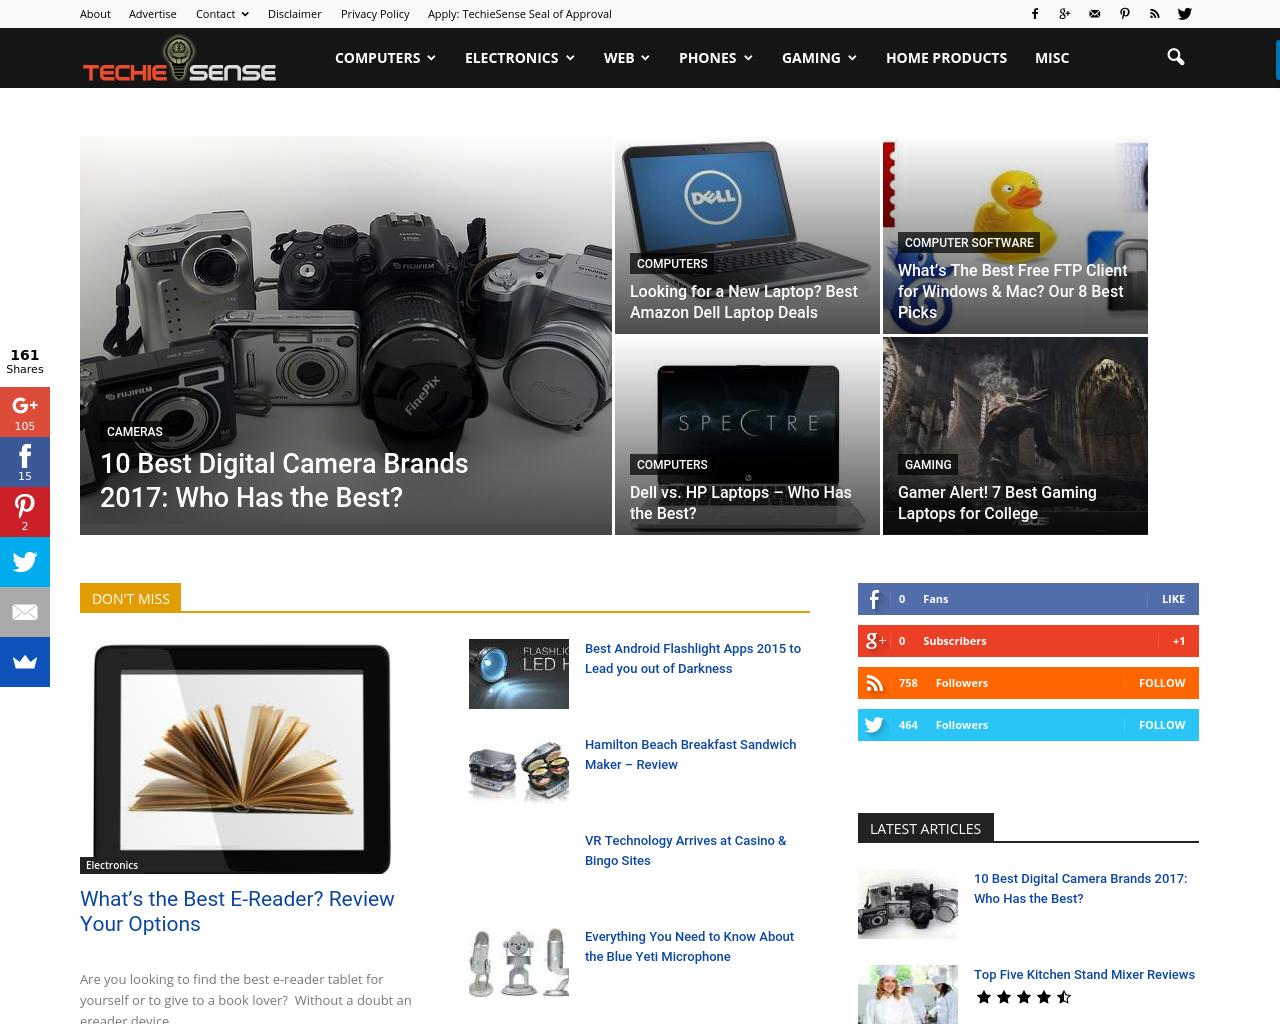 TECHIE-SENSE-Advertising-Reviews-Pricing